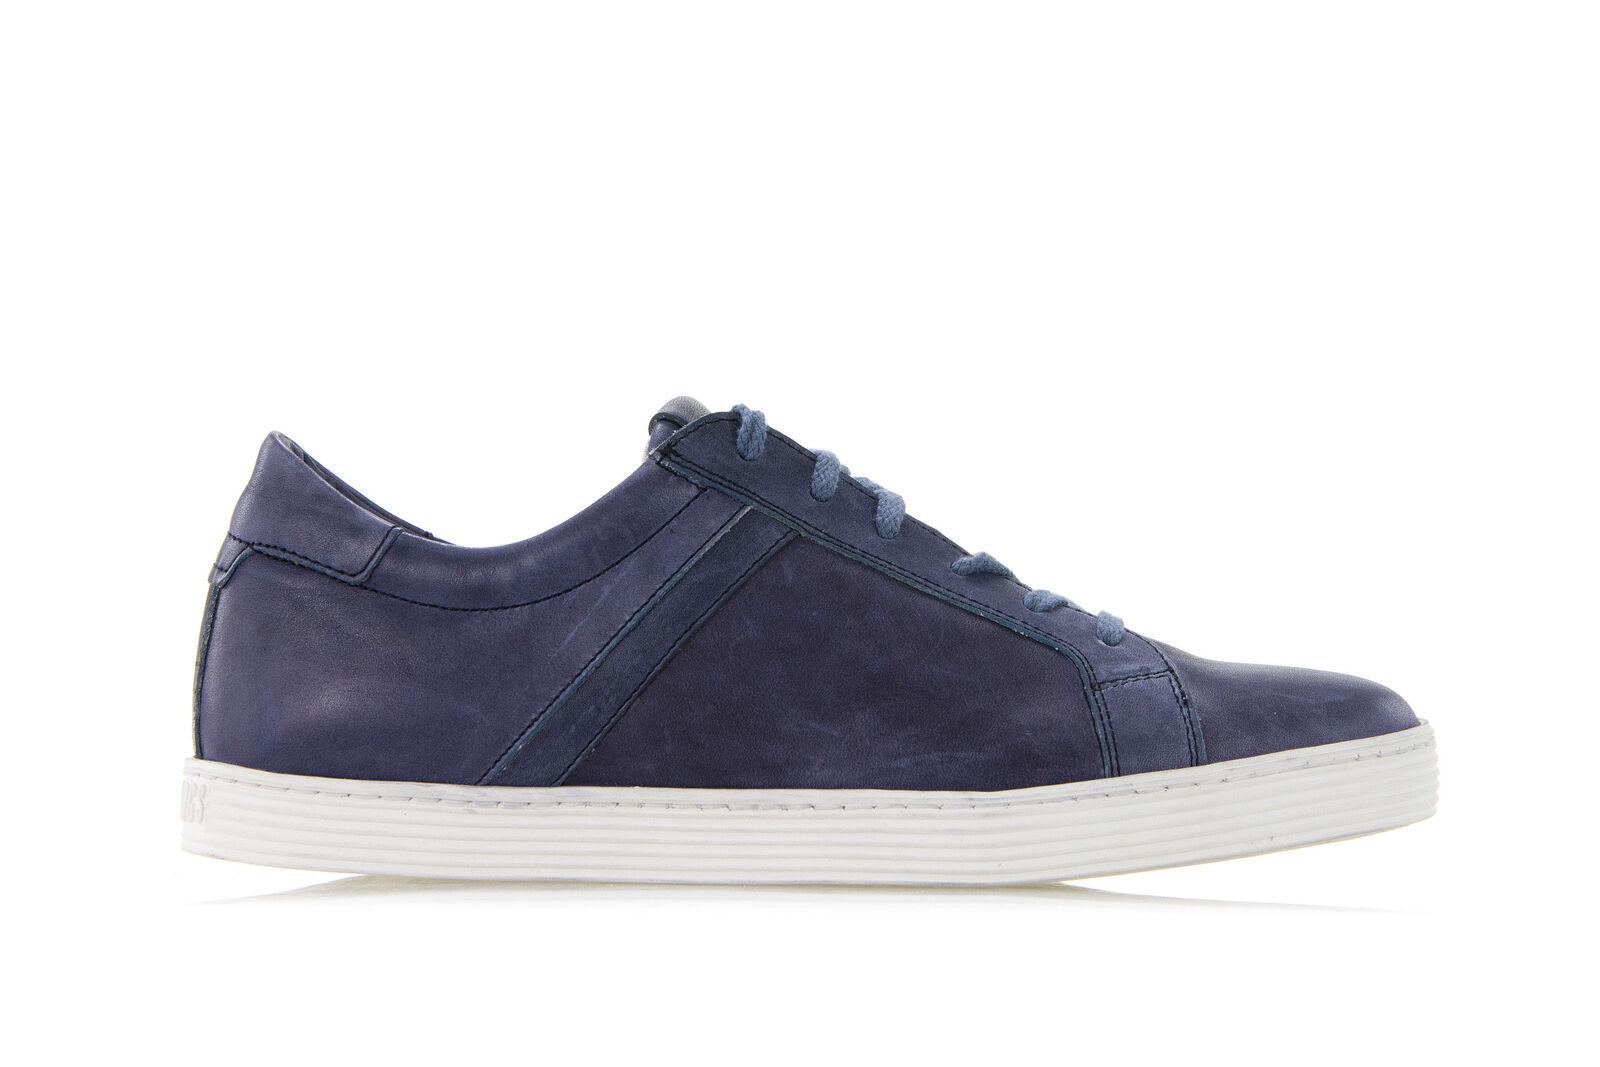 BIKKEMBERGS zapatos zapatillas hombres WORDS 892 LOW zapatos Pelle Vintage azul